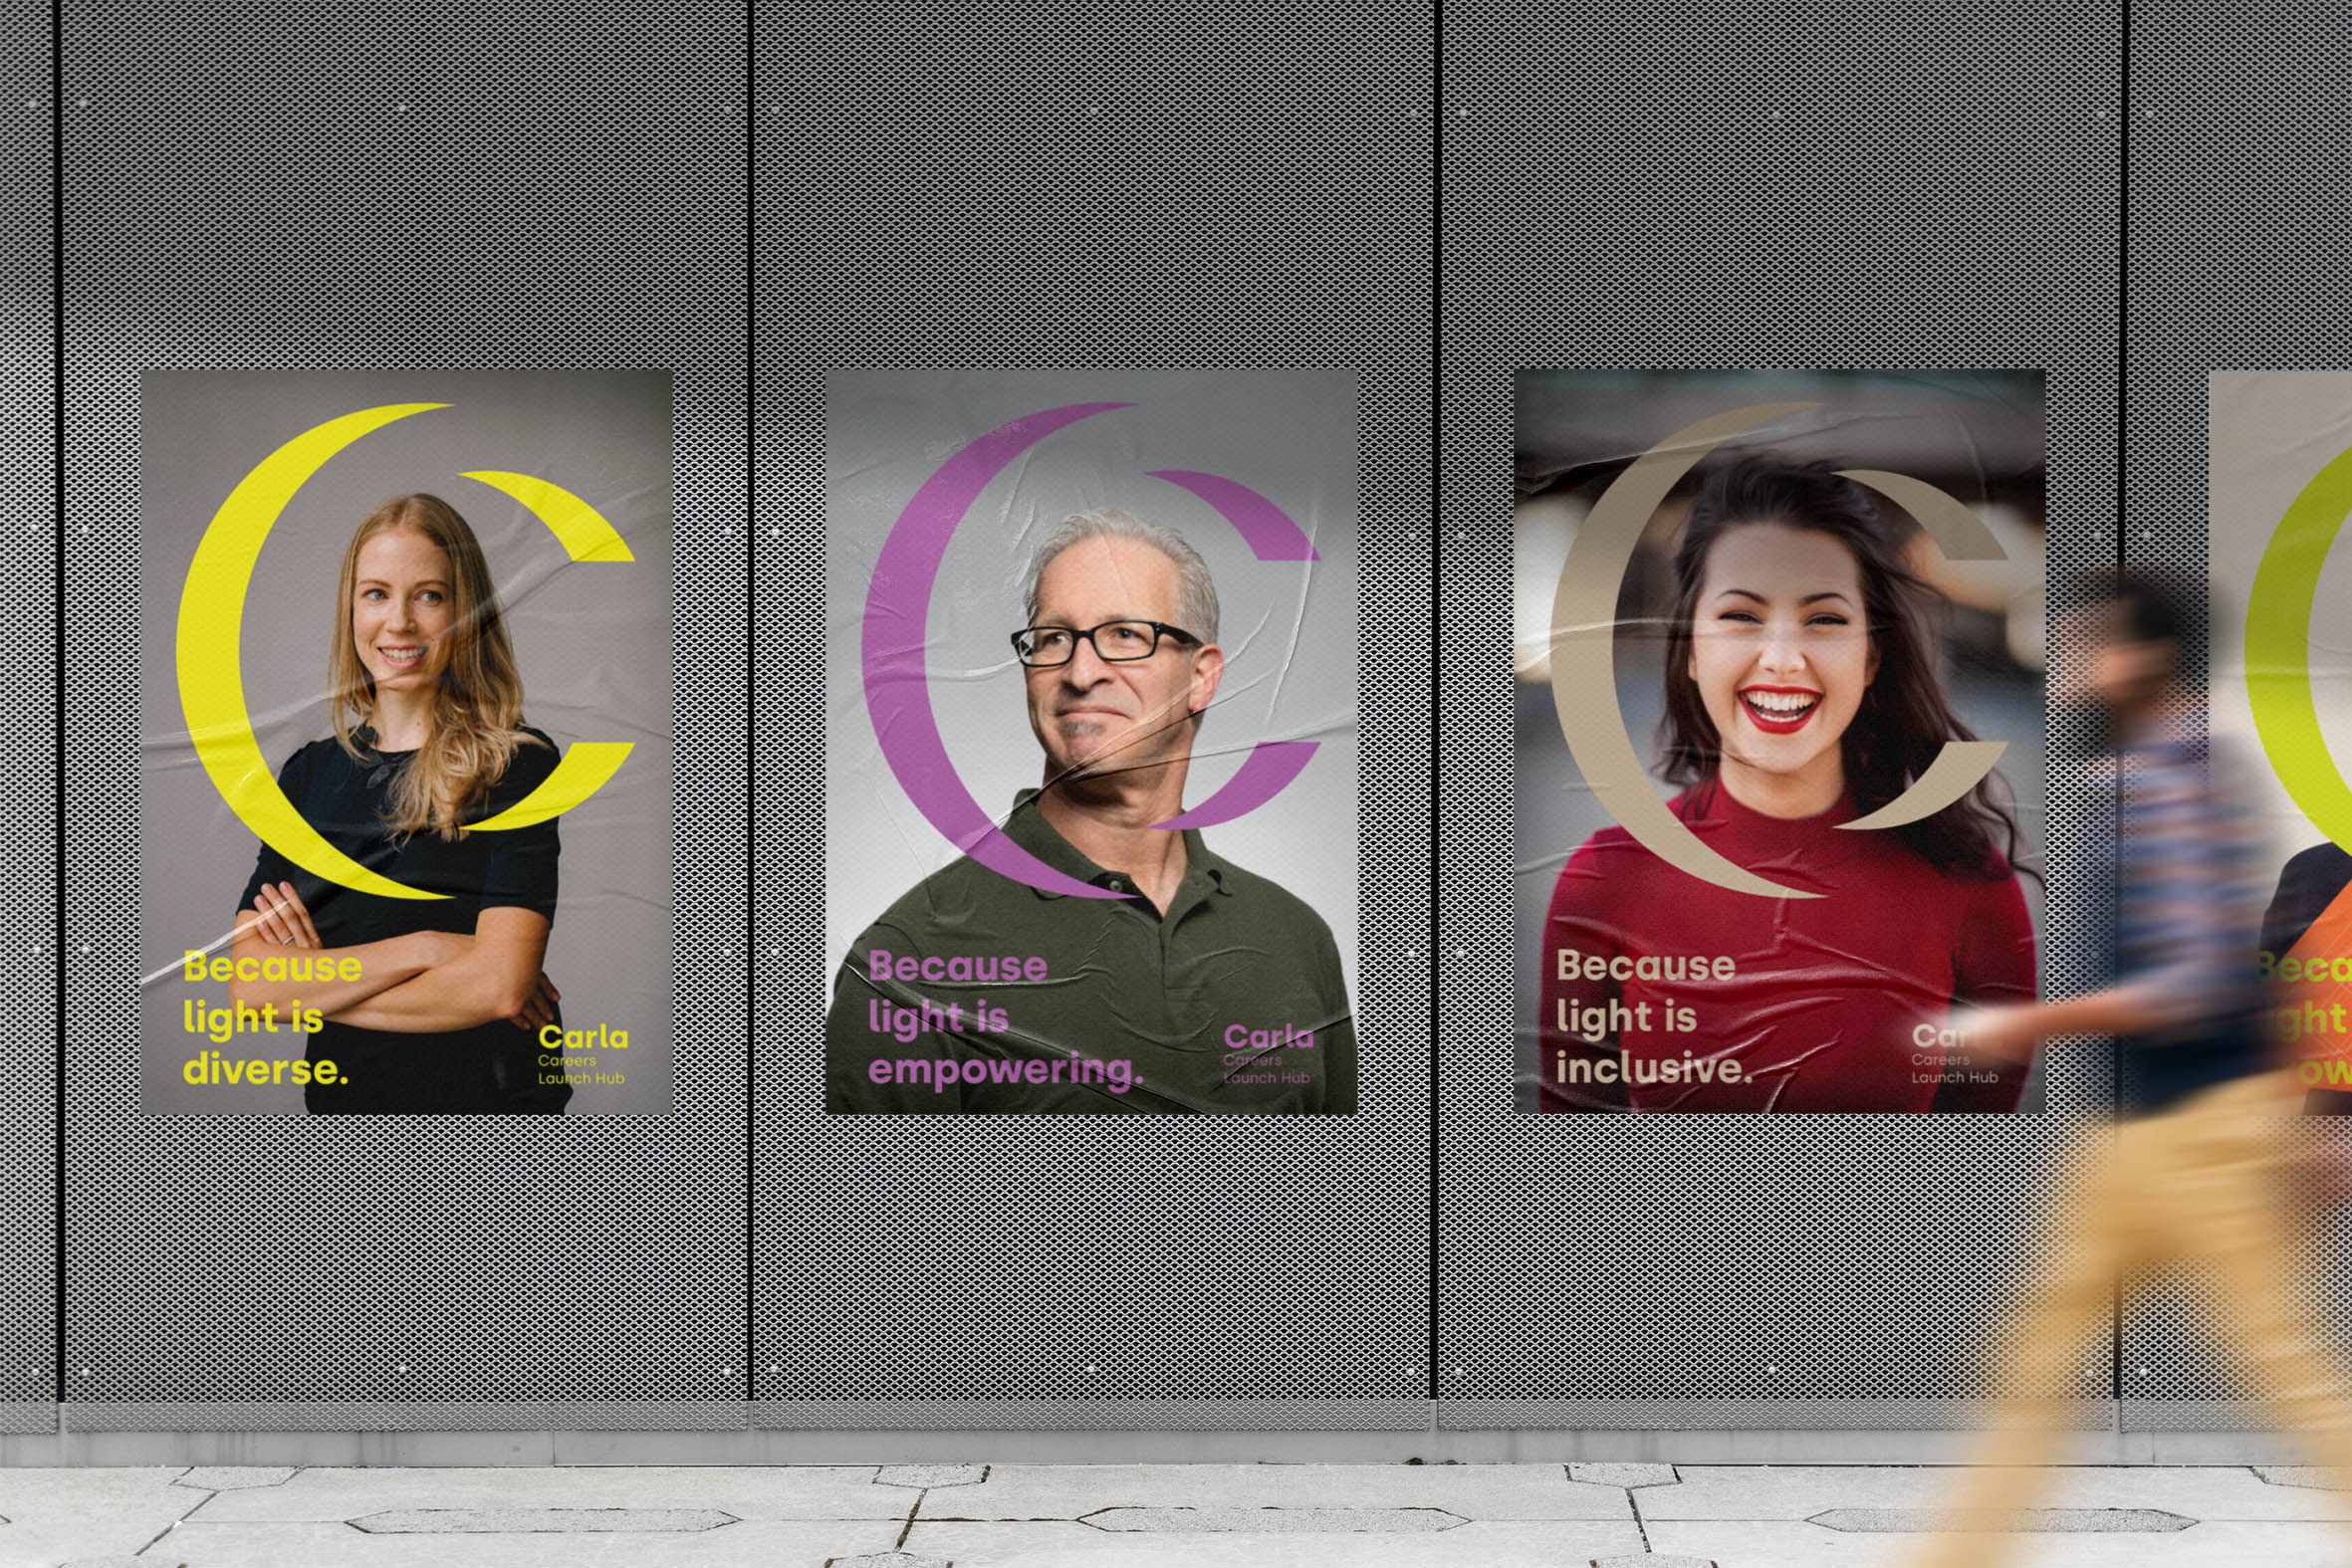 Bitflow-studio-carla-communication-design-poster-2